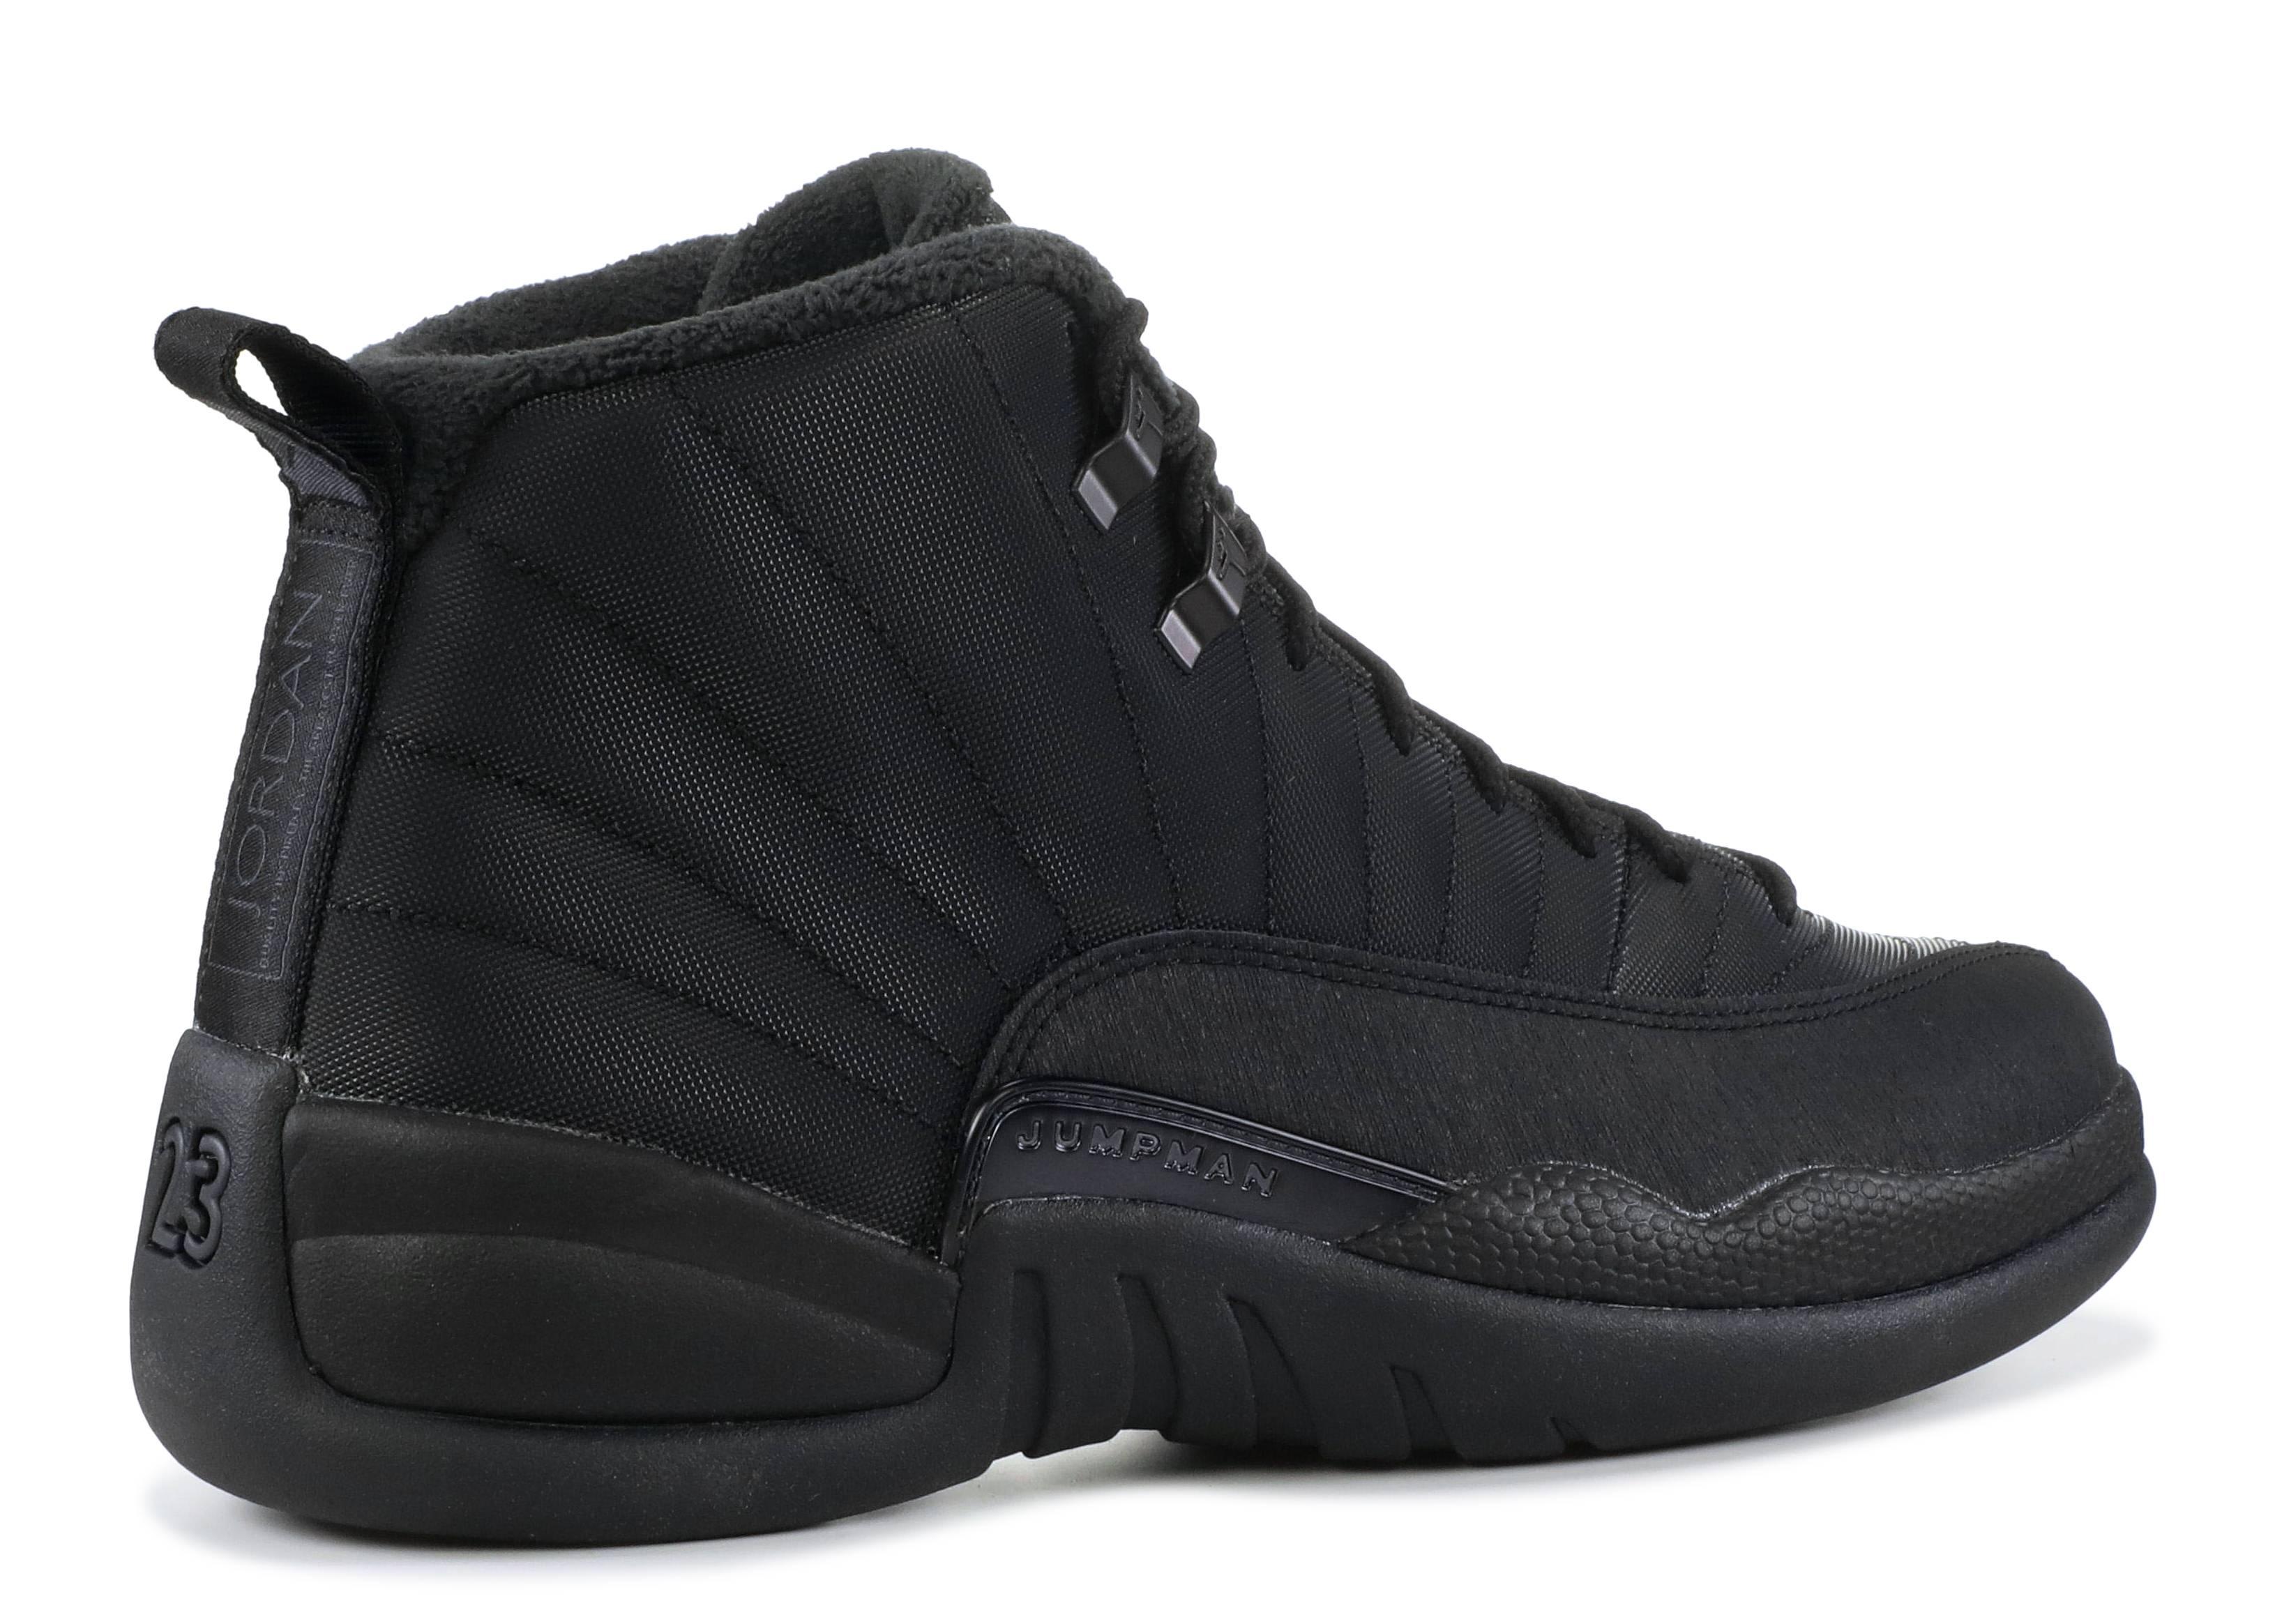 salón Adjunto archivo Cerveza  Air Jordan 12 Retro Winterized 'Triple Black' - Air Jordan - BQ6851 001 -  black/black-anthracite | Flight Club